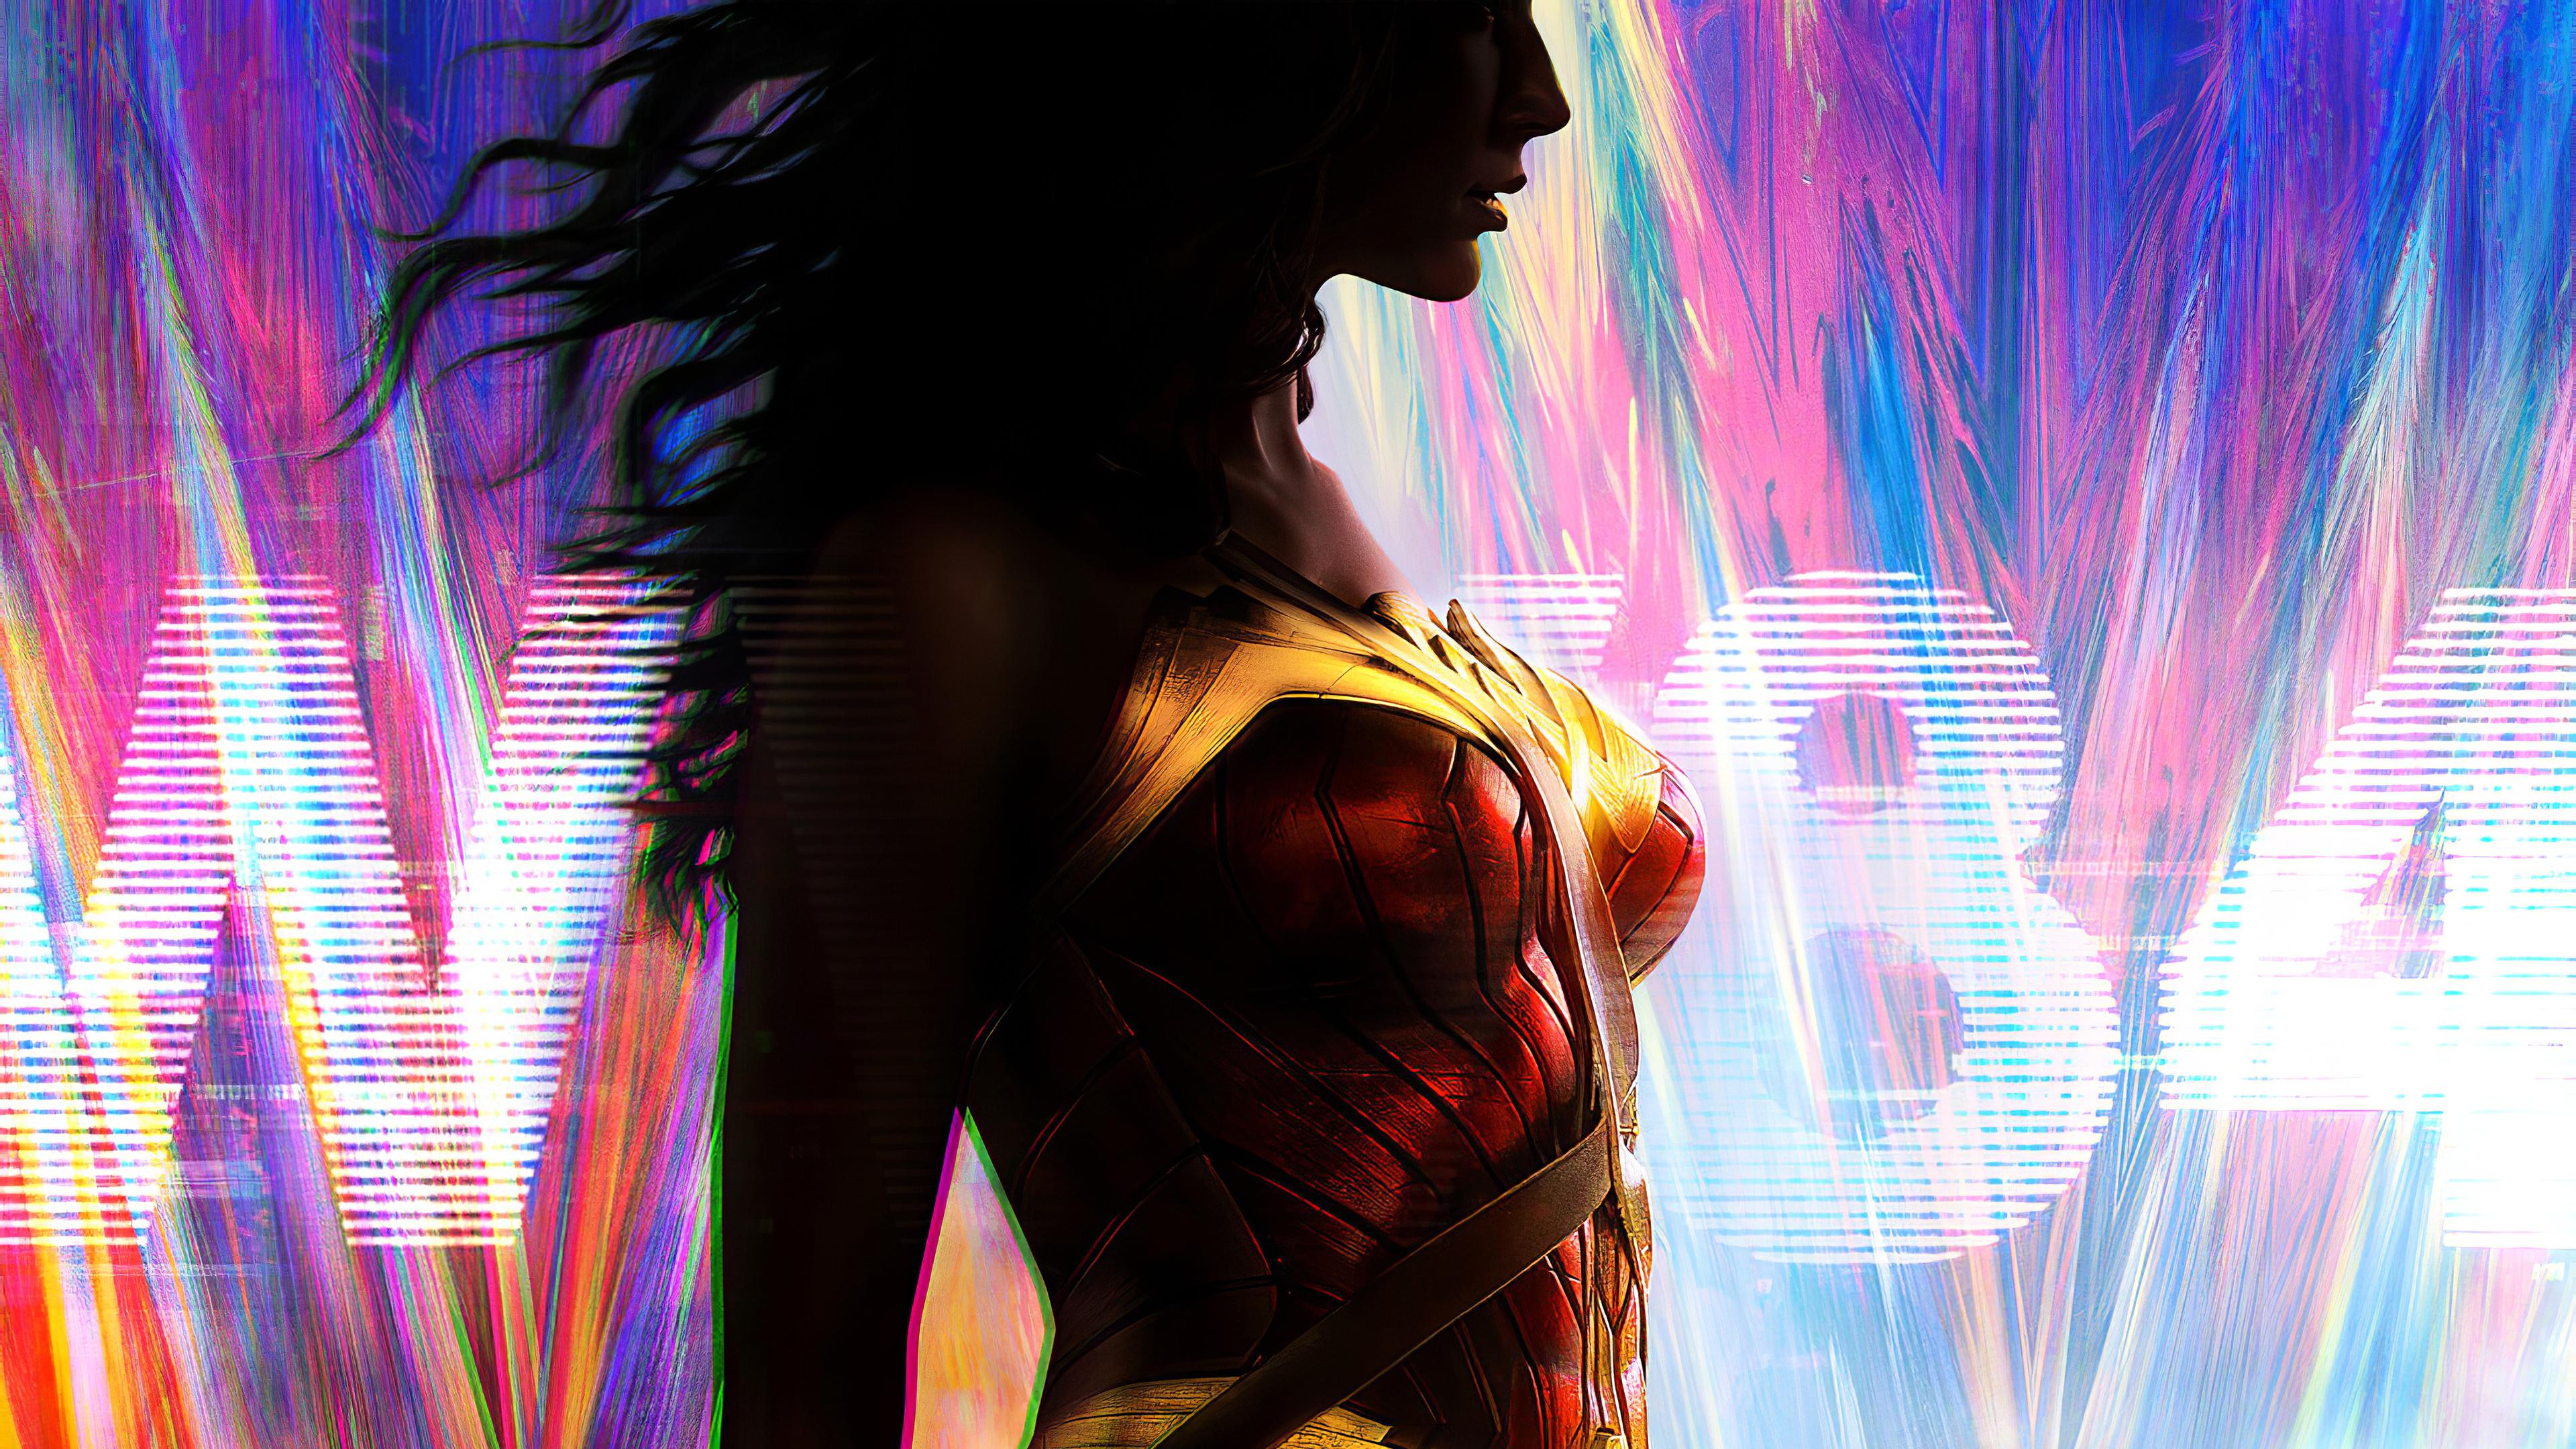 wonder woman 1984 art 1576584633 - Wonder Woman 1984 Art - Wonder Woman wallpaper 4k, Wonder Woman wallpaper 1984, Wonder Woman movie 4k wallpaper, Wonder Woman 1984 4k wallpaper